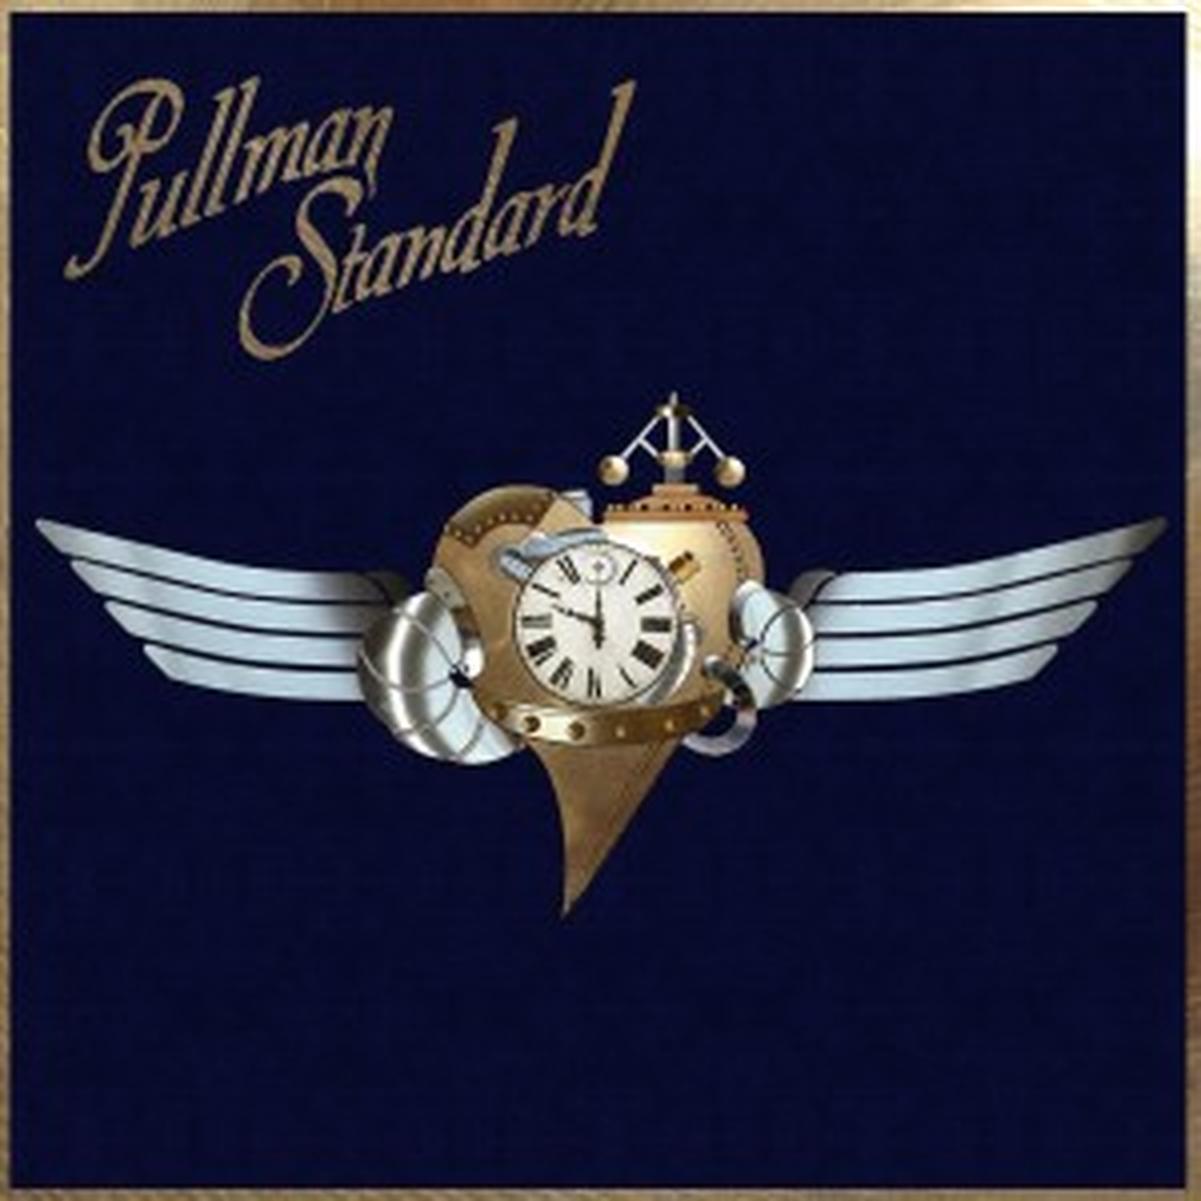 Pullman Standard